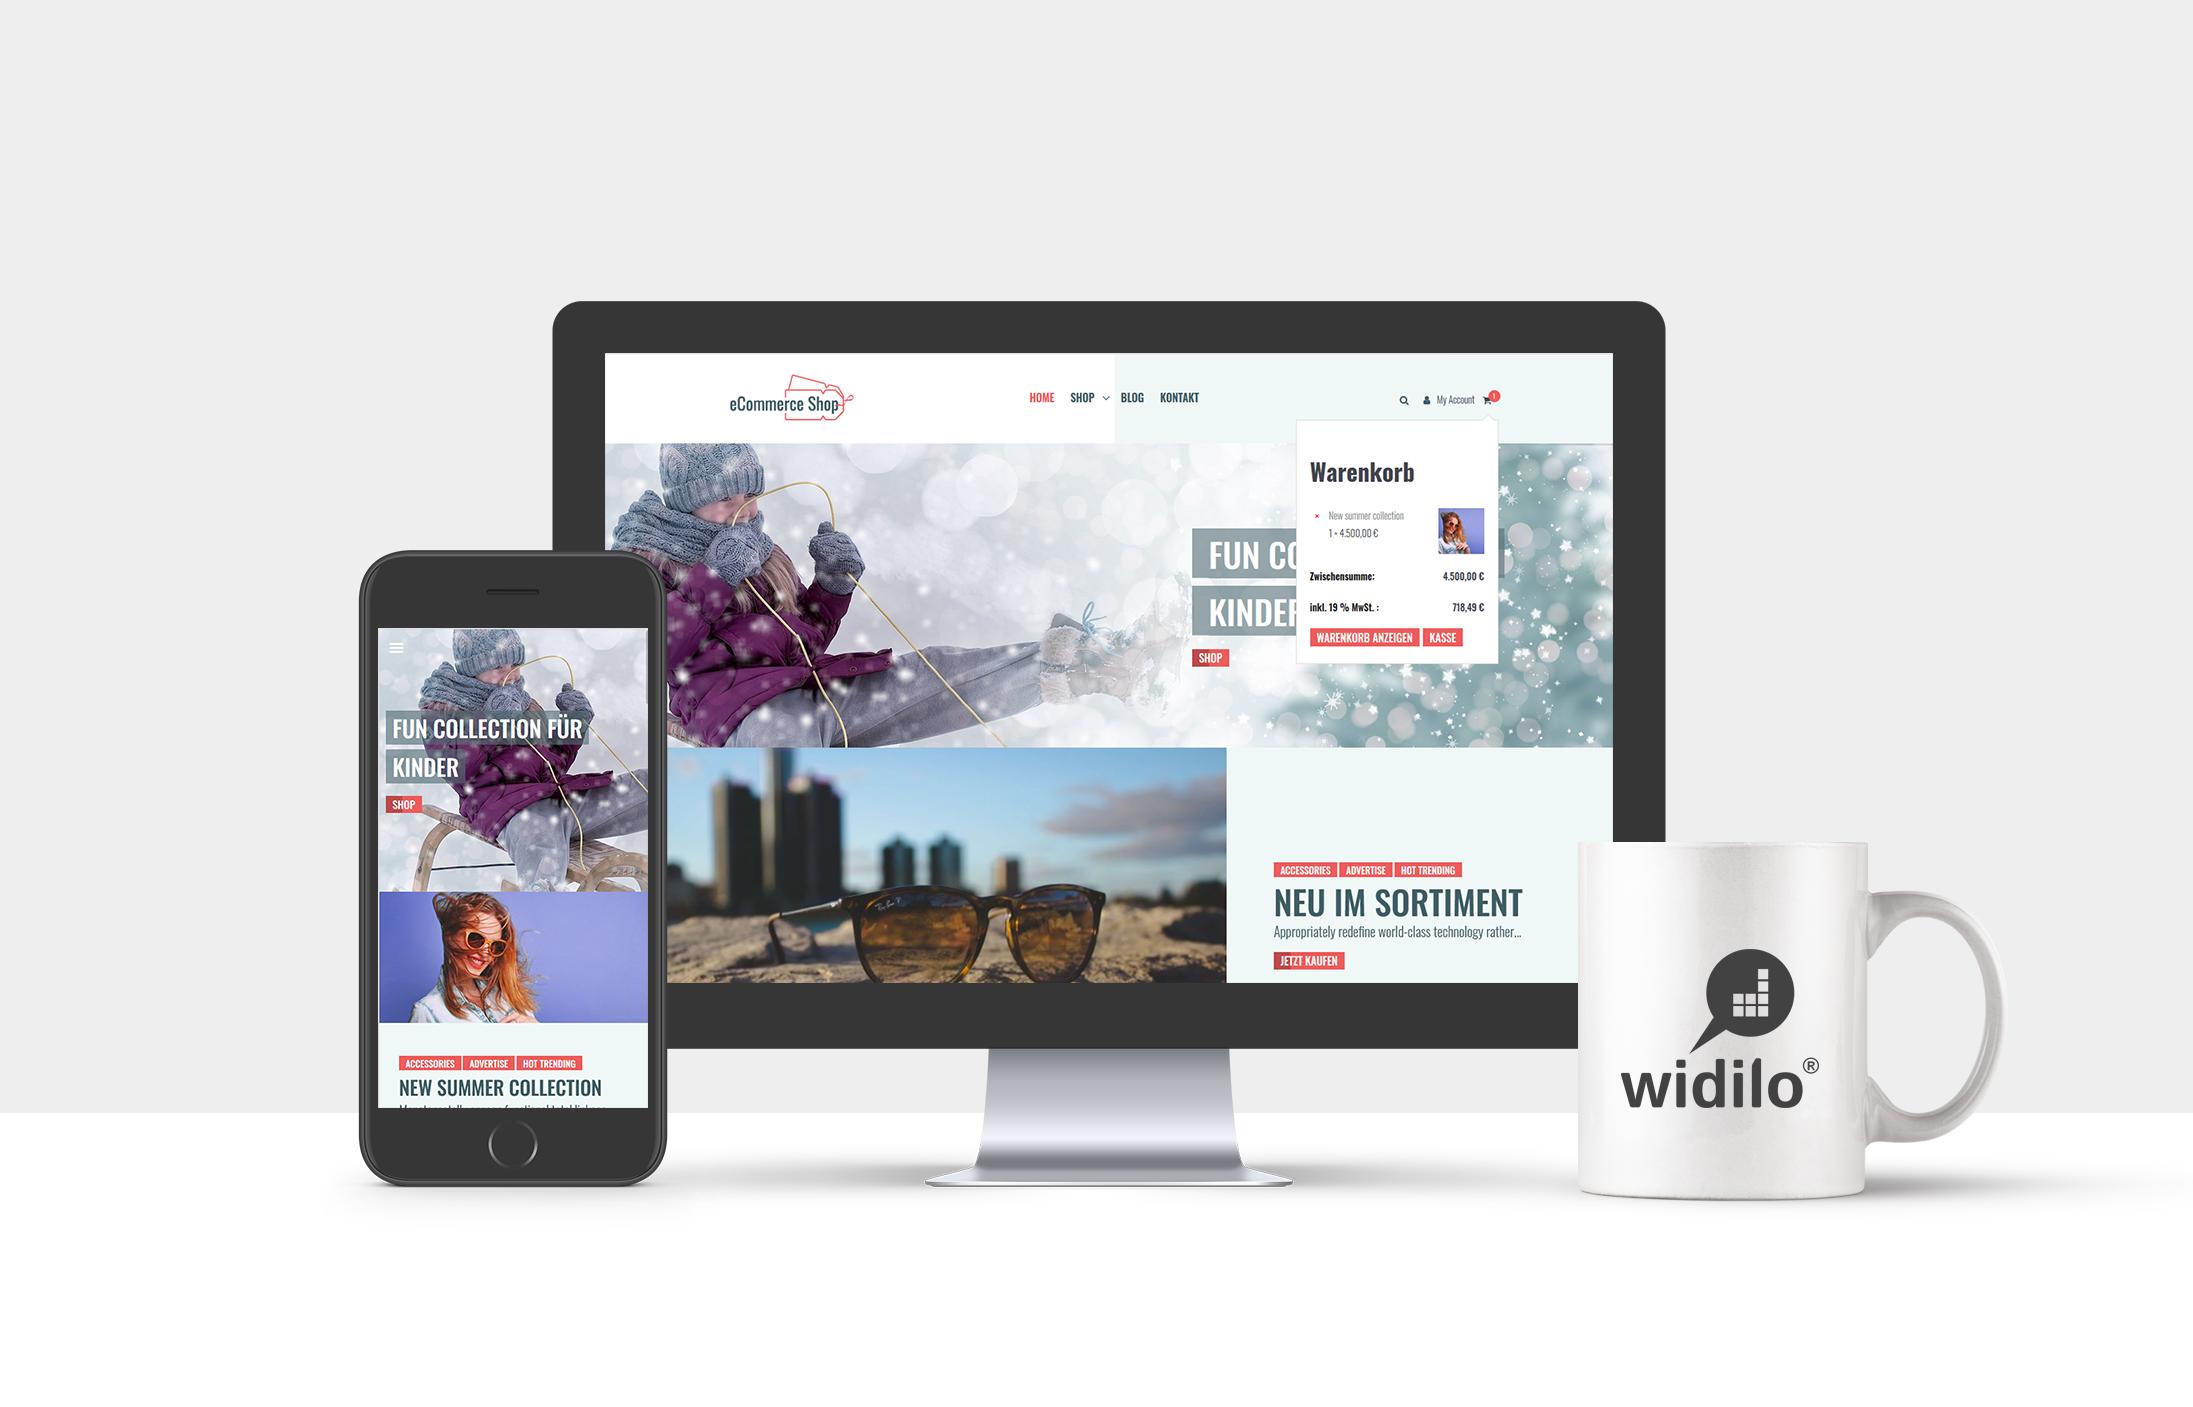 Münnecke & Vollmers GbR widilo, Onlineshops, E-Commerce, Demoversion, Best-Practice